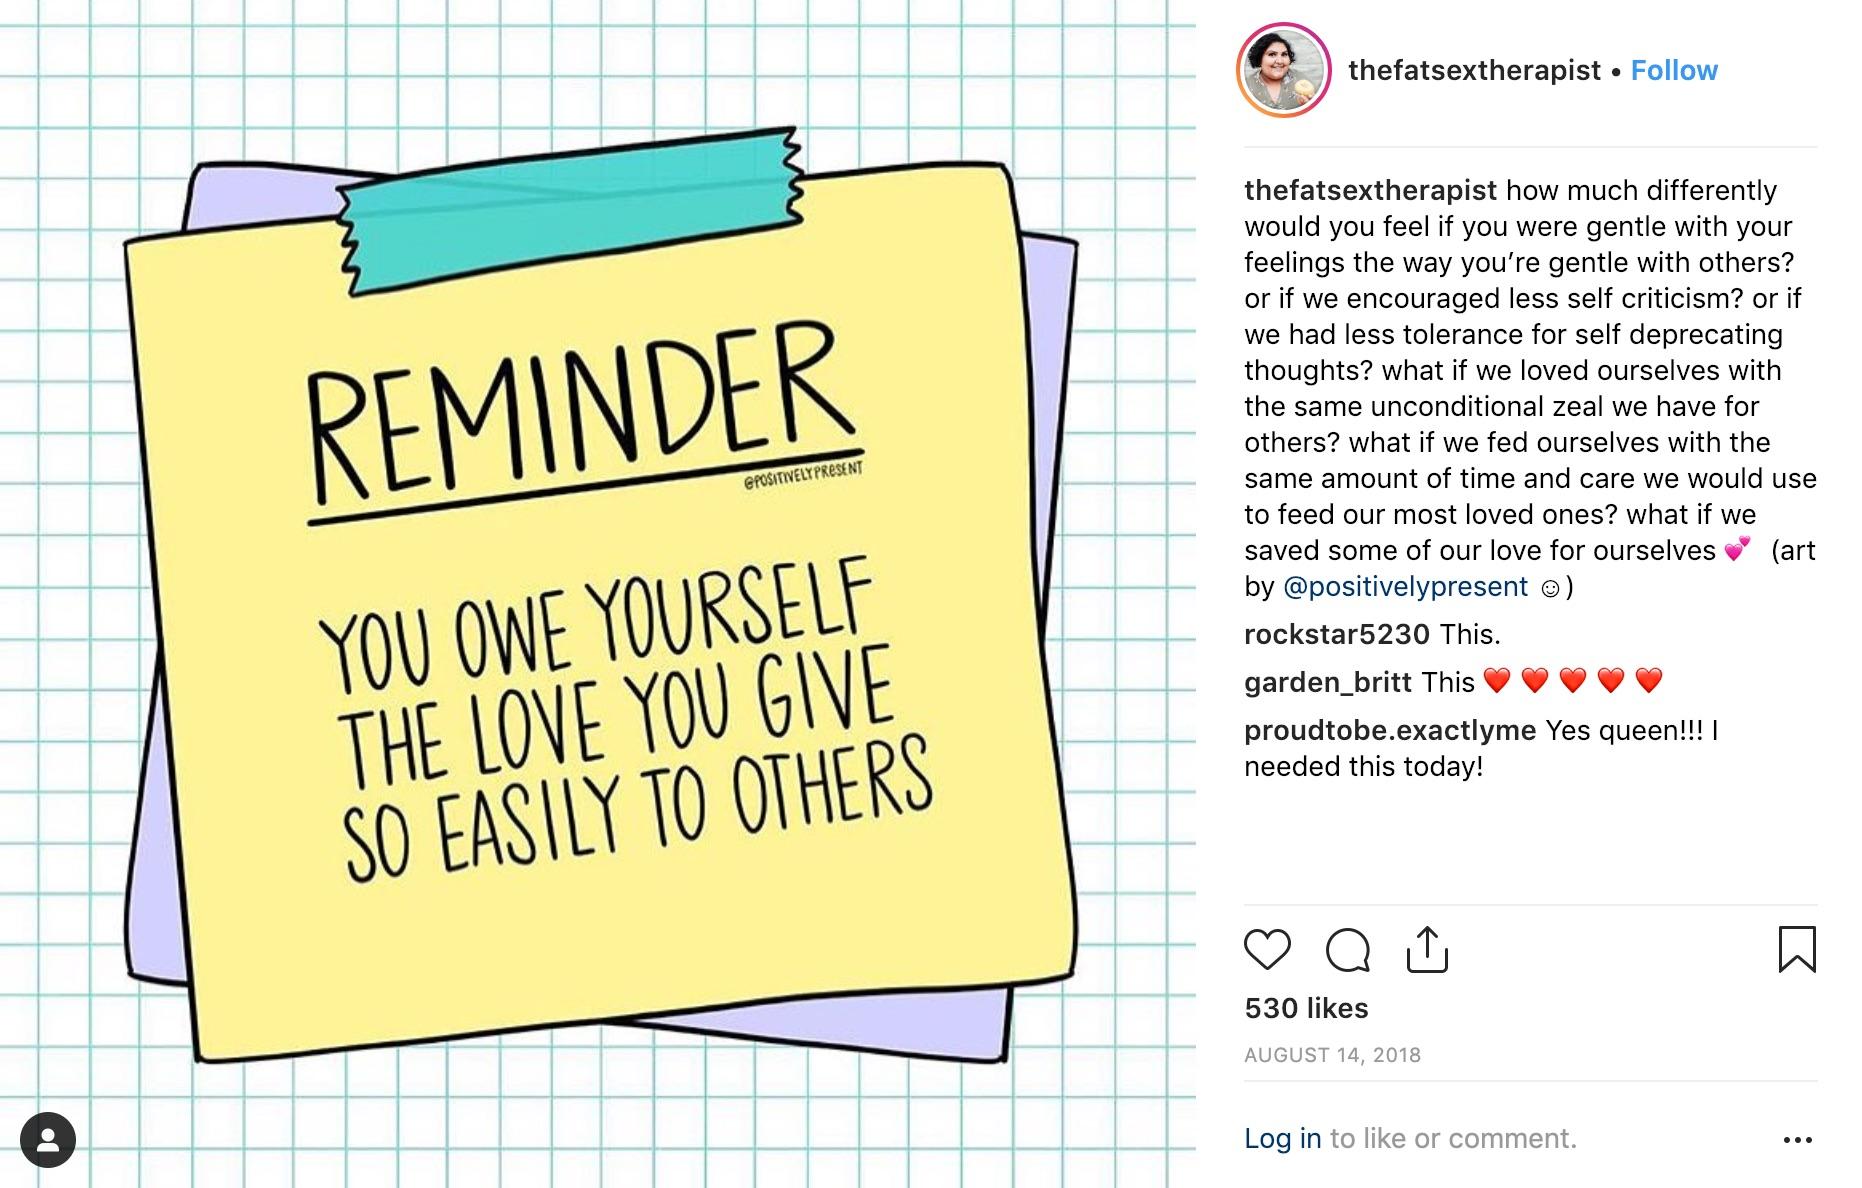 A good reminder.